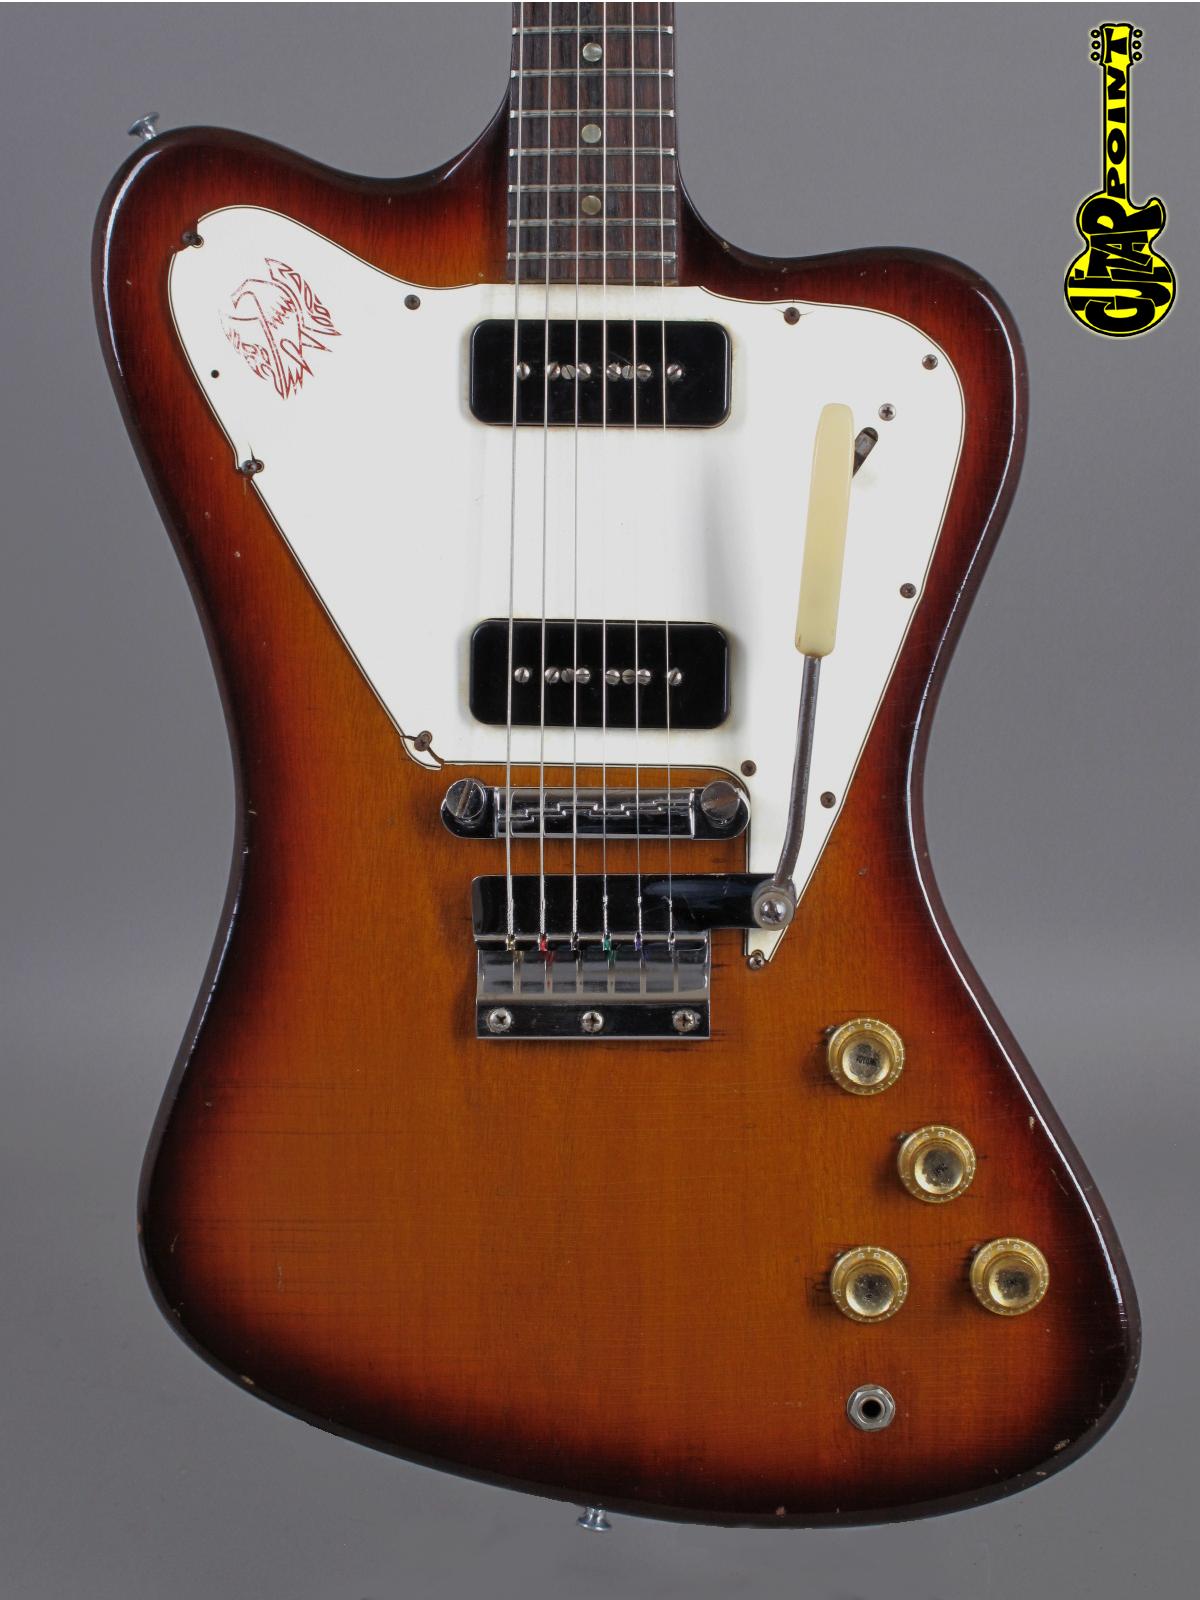 1965 Gibson Firebird I / non-reversed - Sunburst